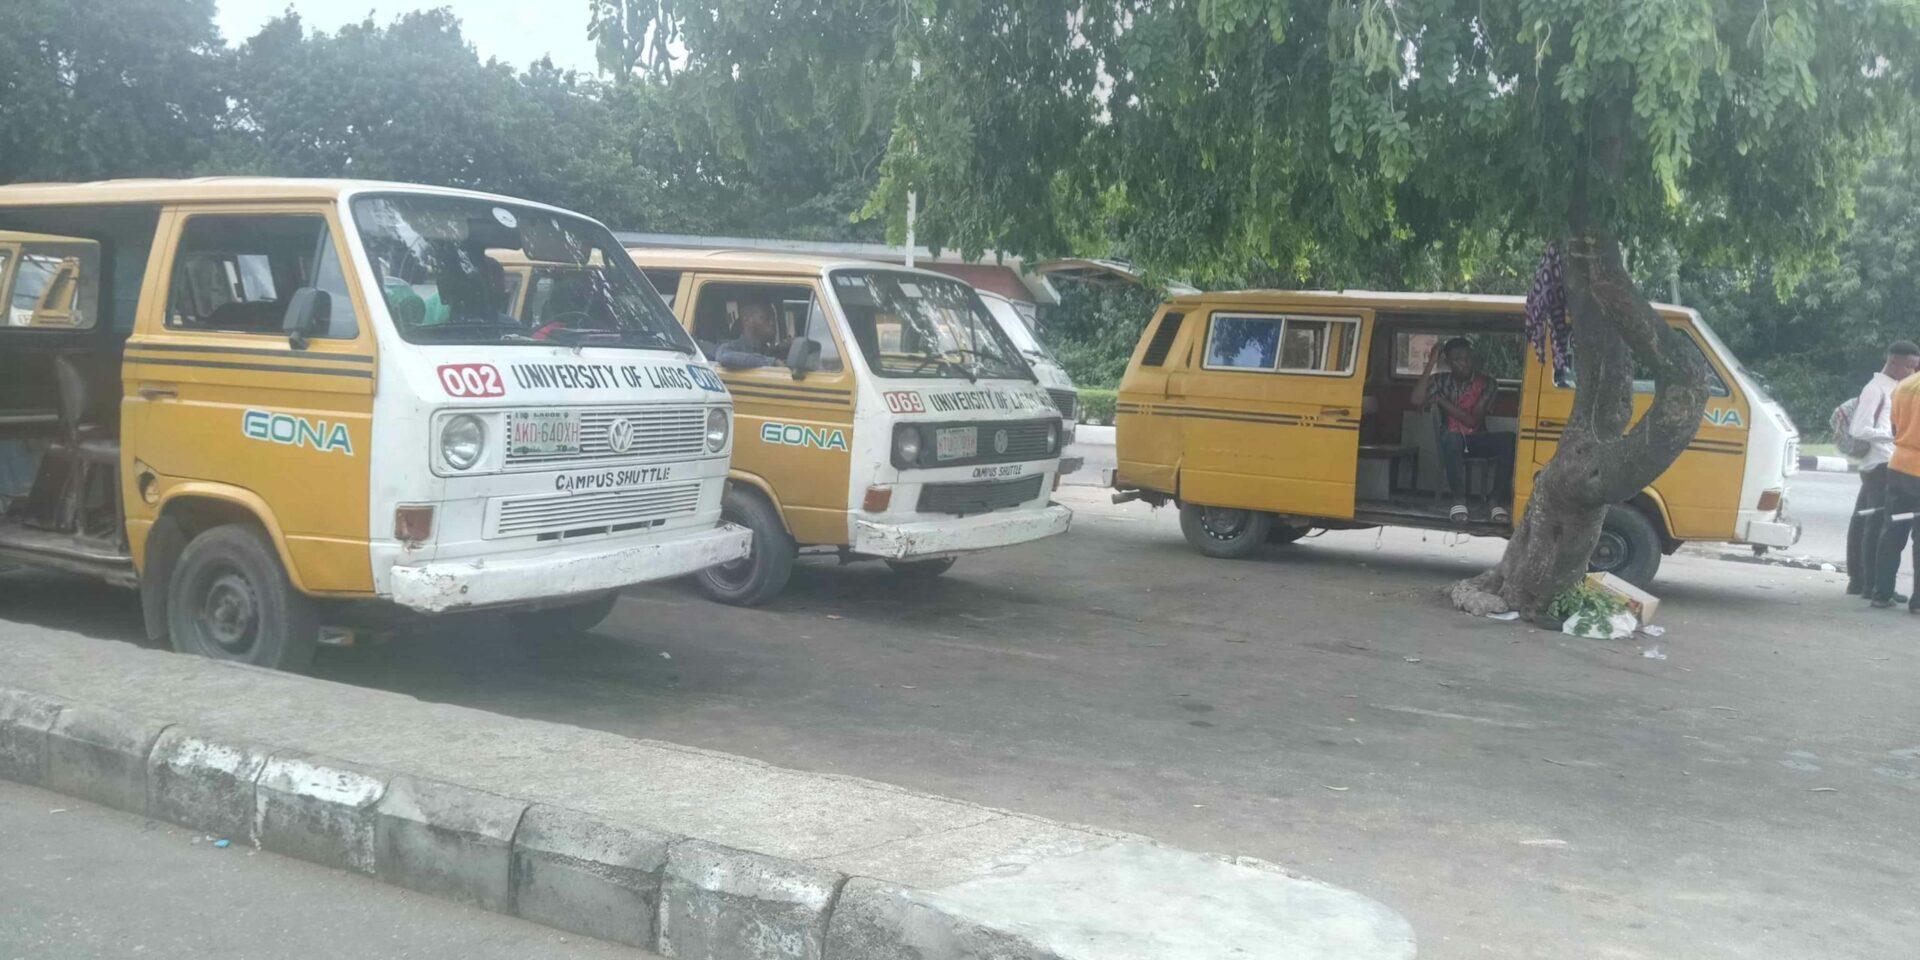 Gona buses scaled